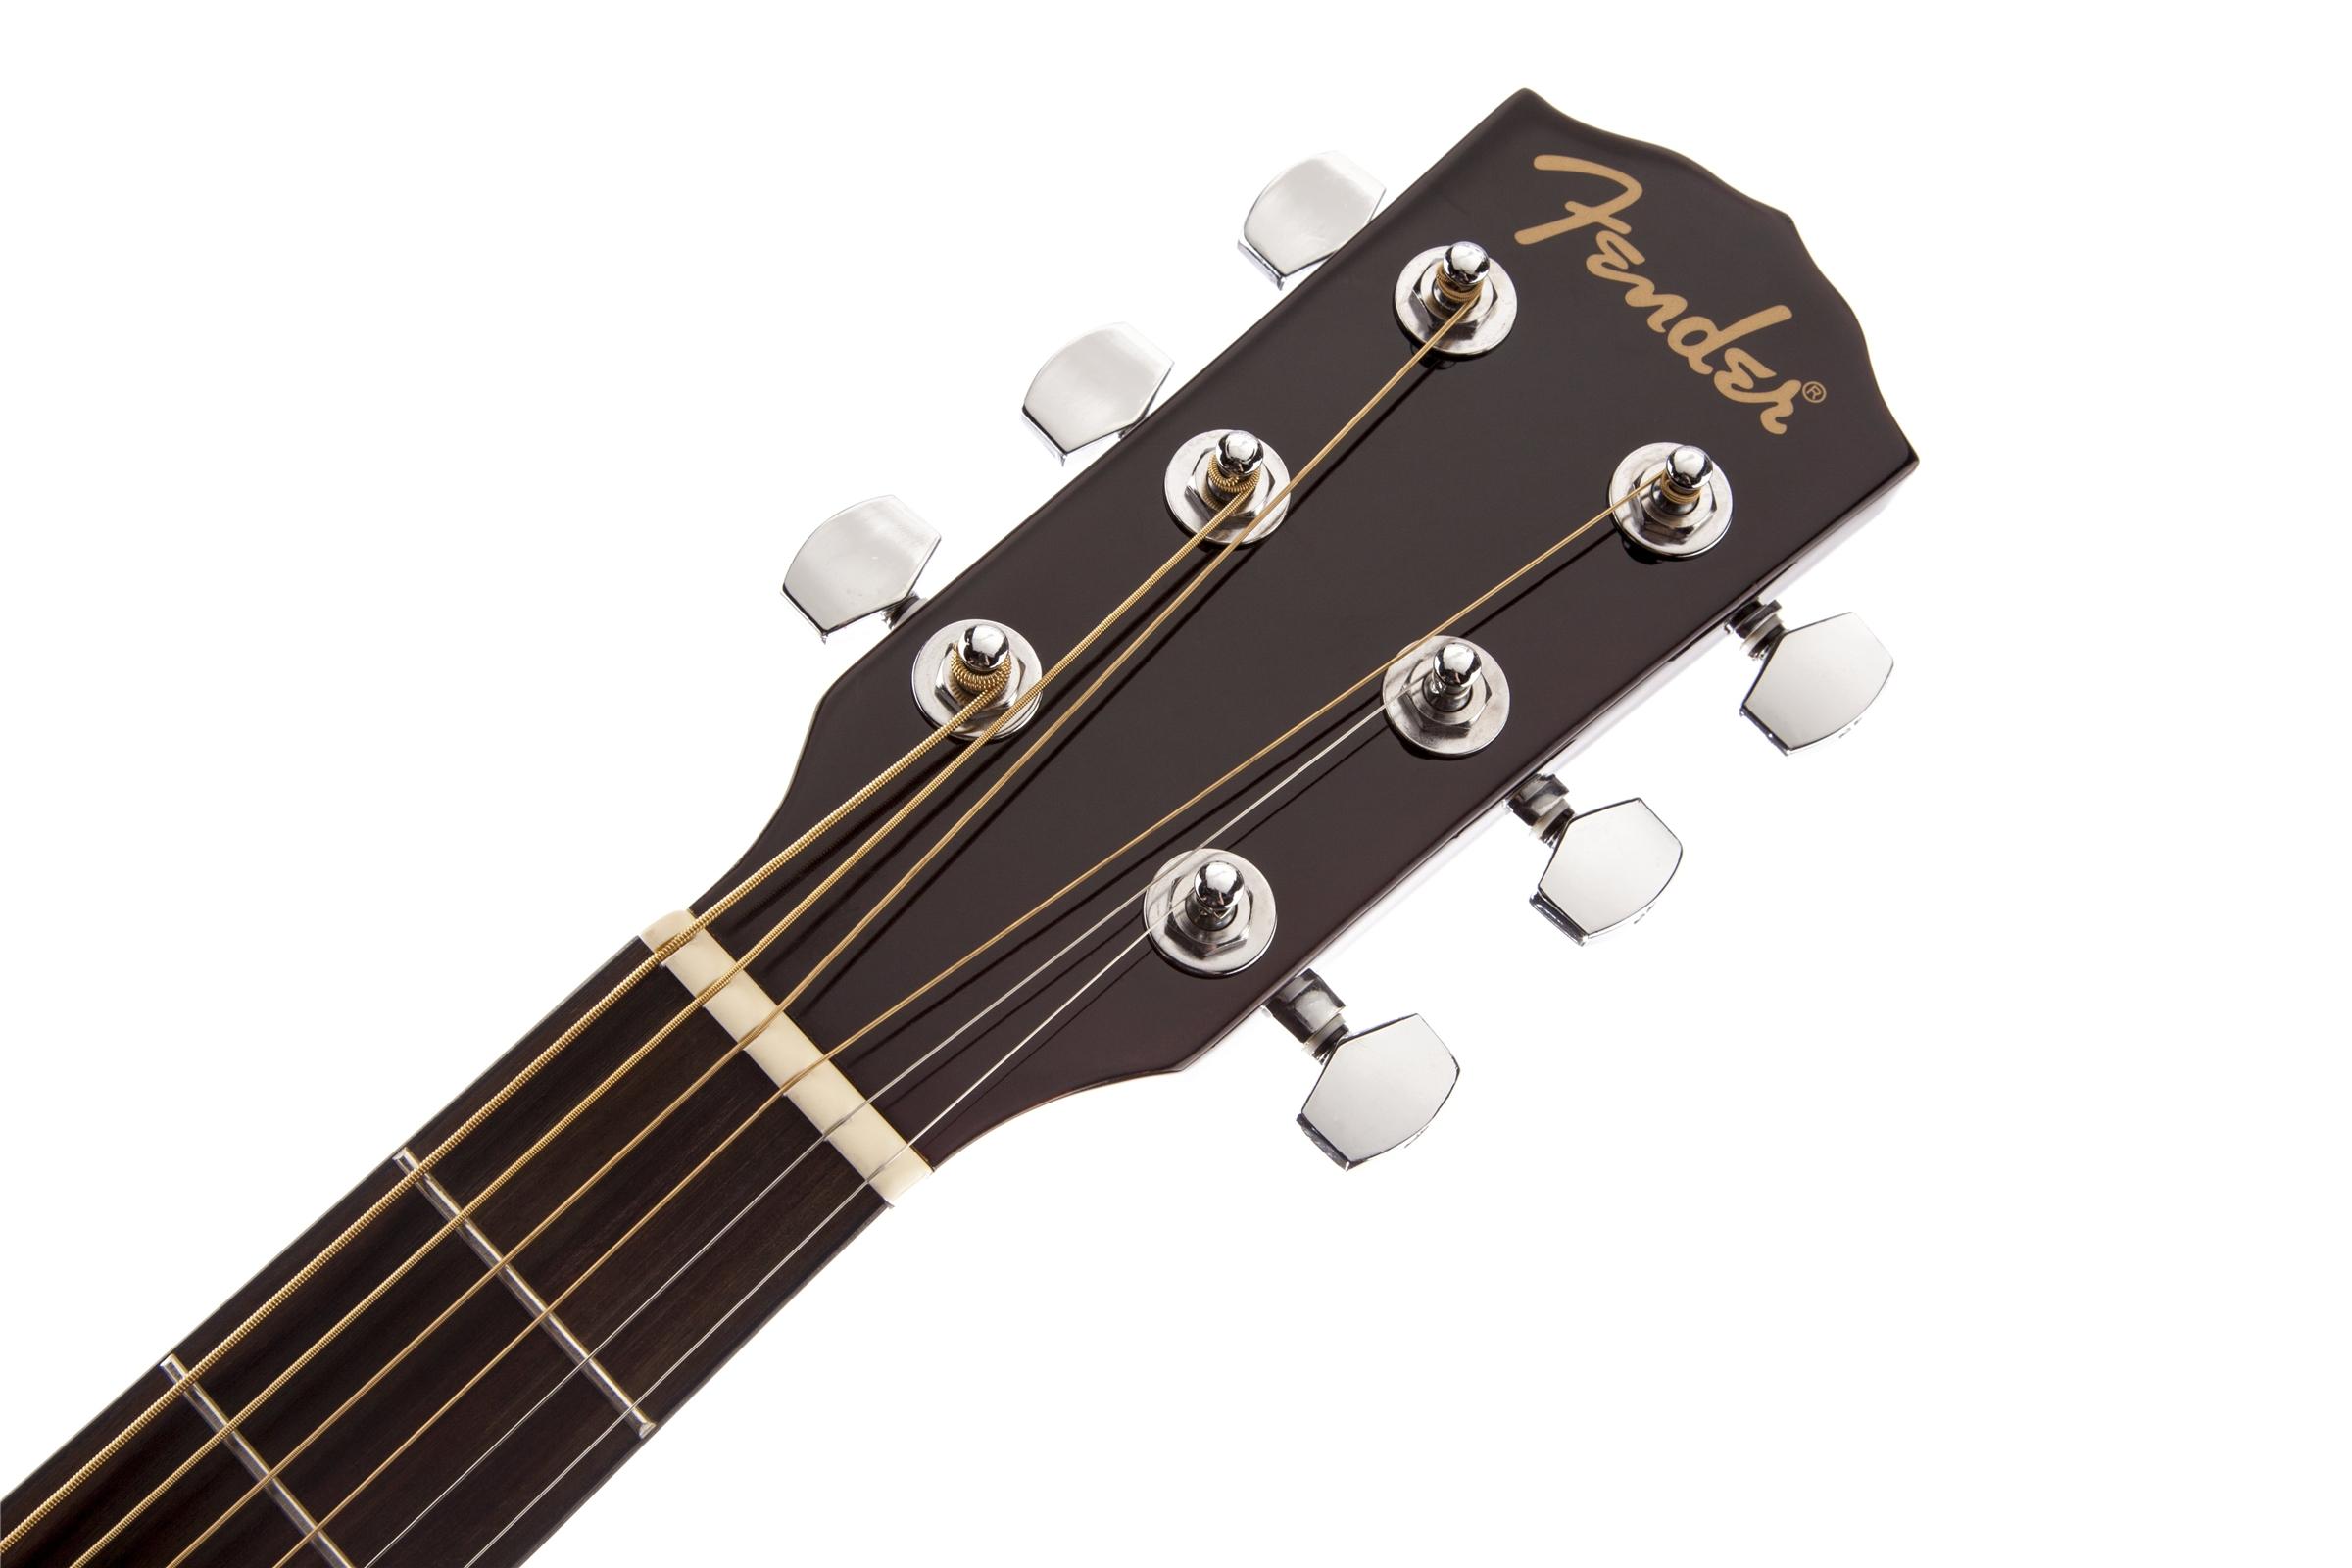 fa 100 acoustic pack acoustic guitars. Black Bedroom Furniture Sets. Home Design Ideas